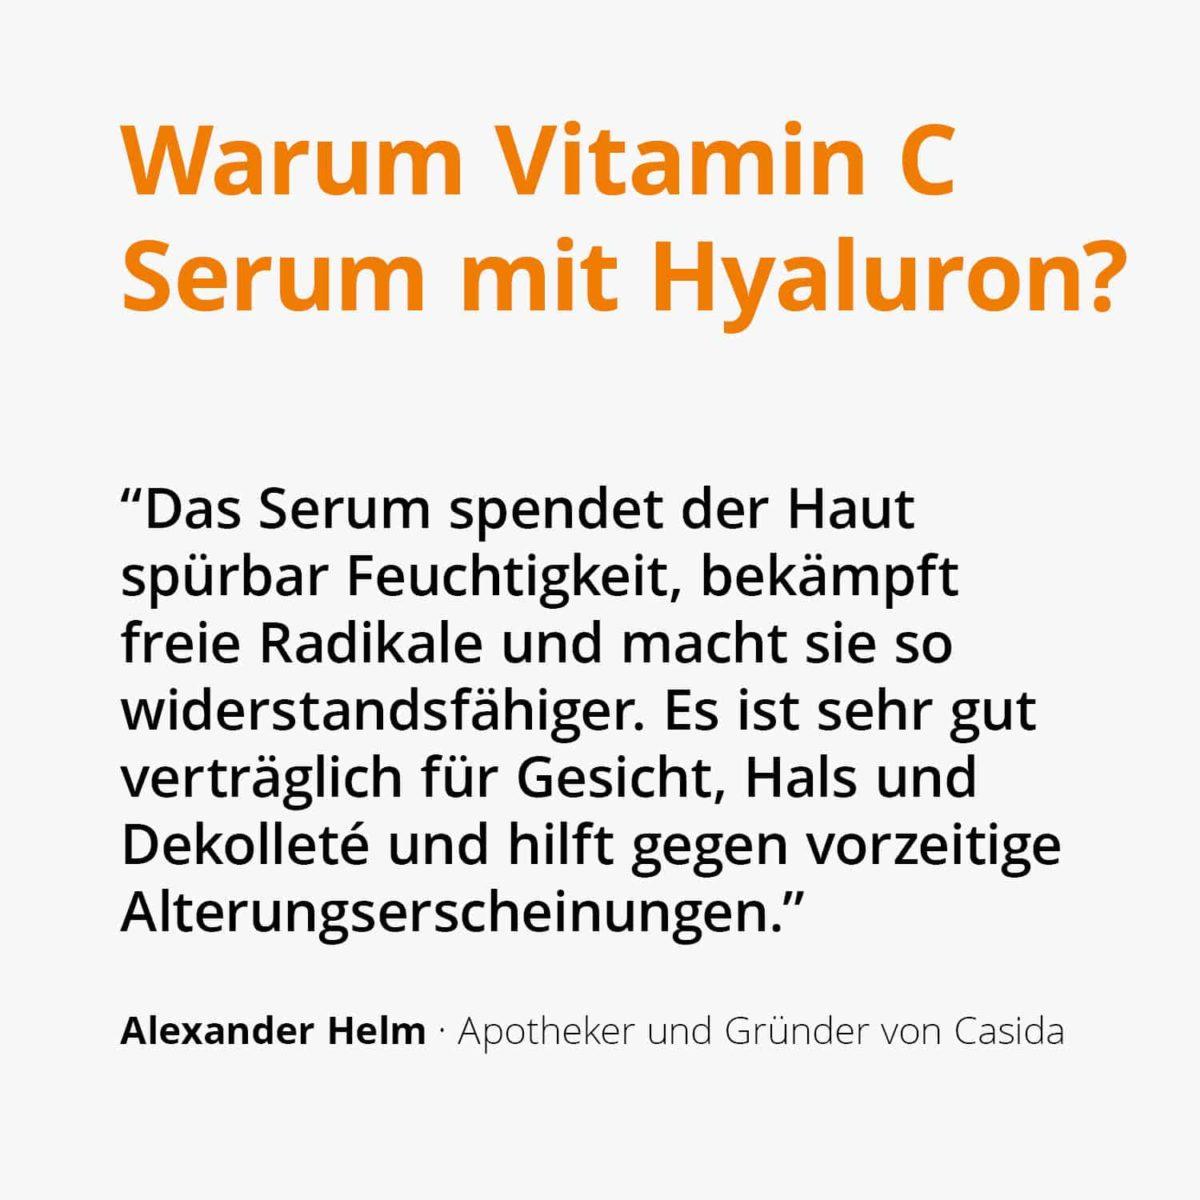 Casida Vitamin C Serum + Hyaluron – 30 ml 14044053 PZN Apotheke Antioxidantien Anti-Aging a (2)